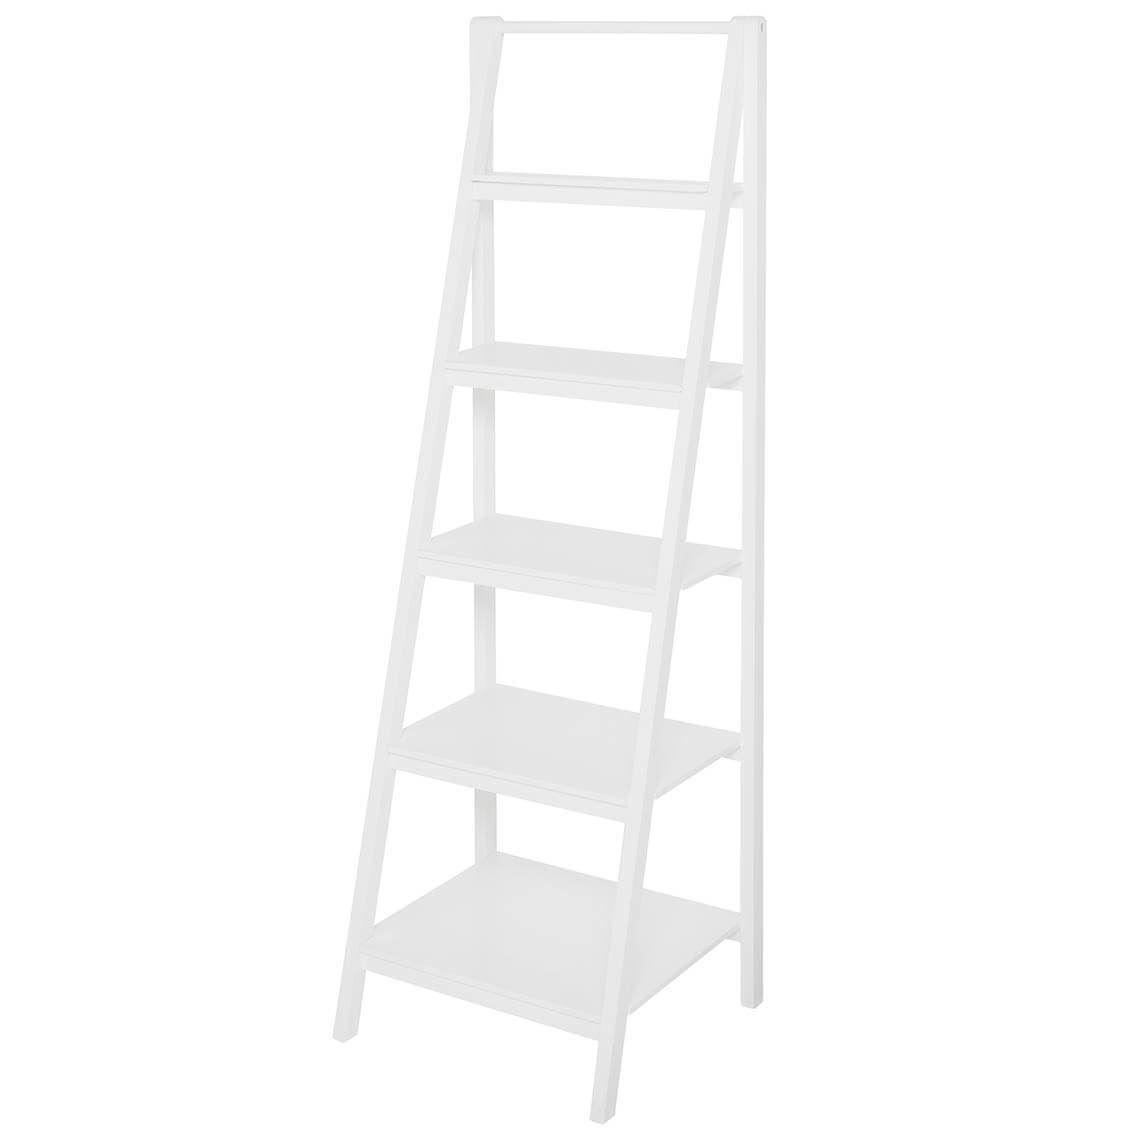 Ladder Storage Unit White Ladder Storage Storage Unit Sizes Storage Unit